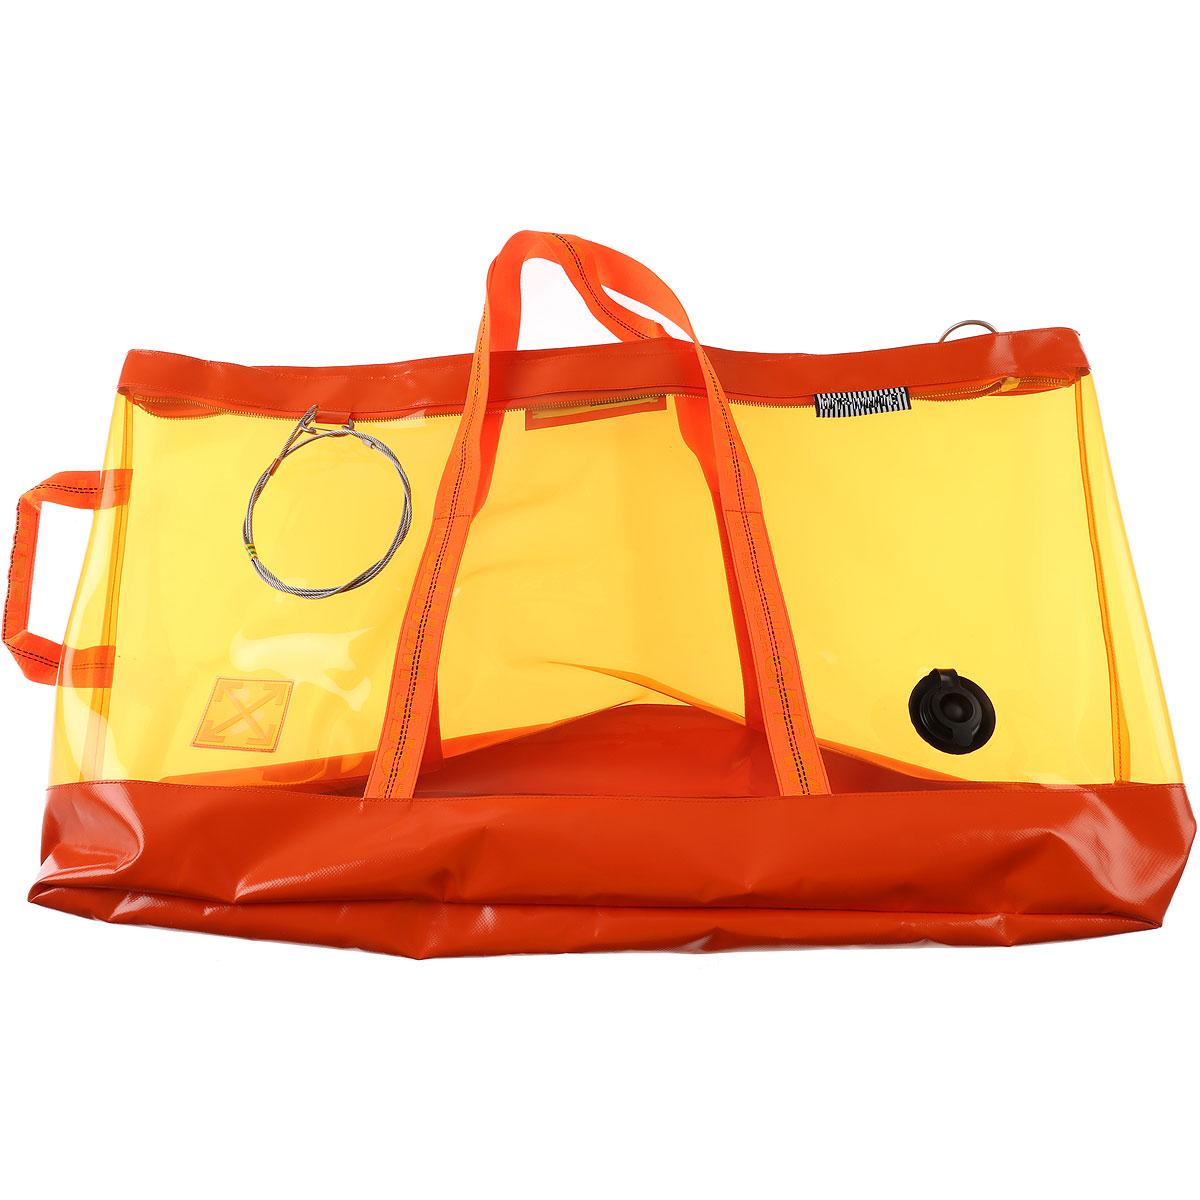 Off-White Virgil Abloh Handbags On Sale, Orange, plastic, 2019